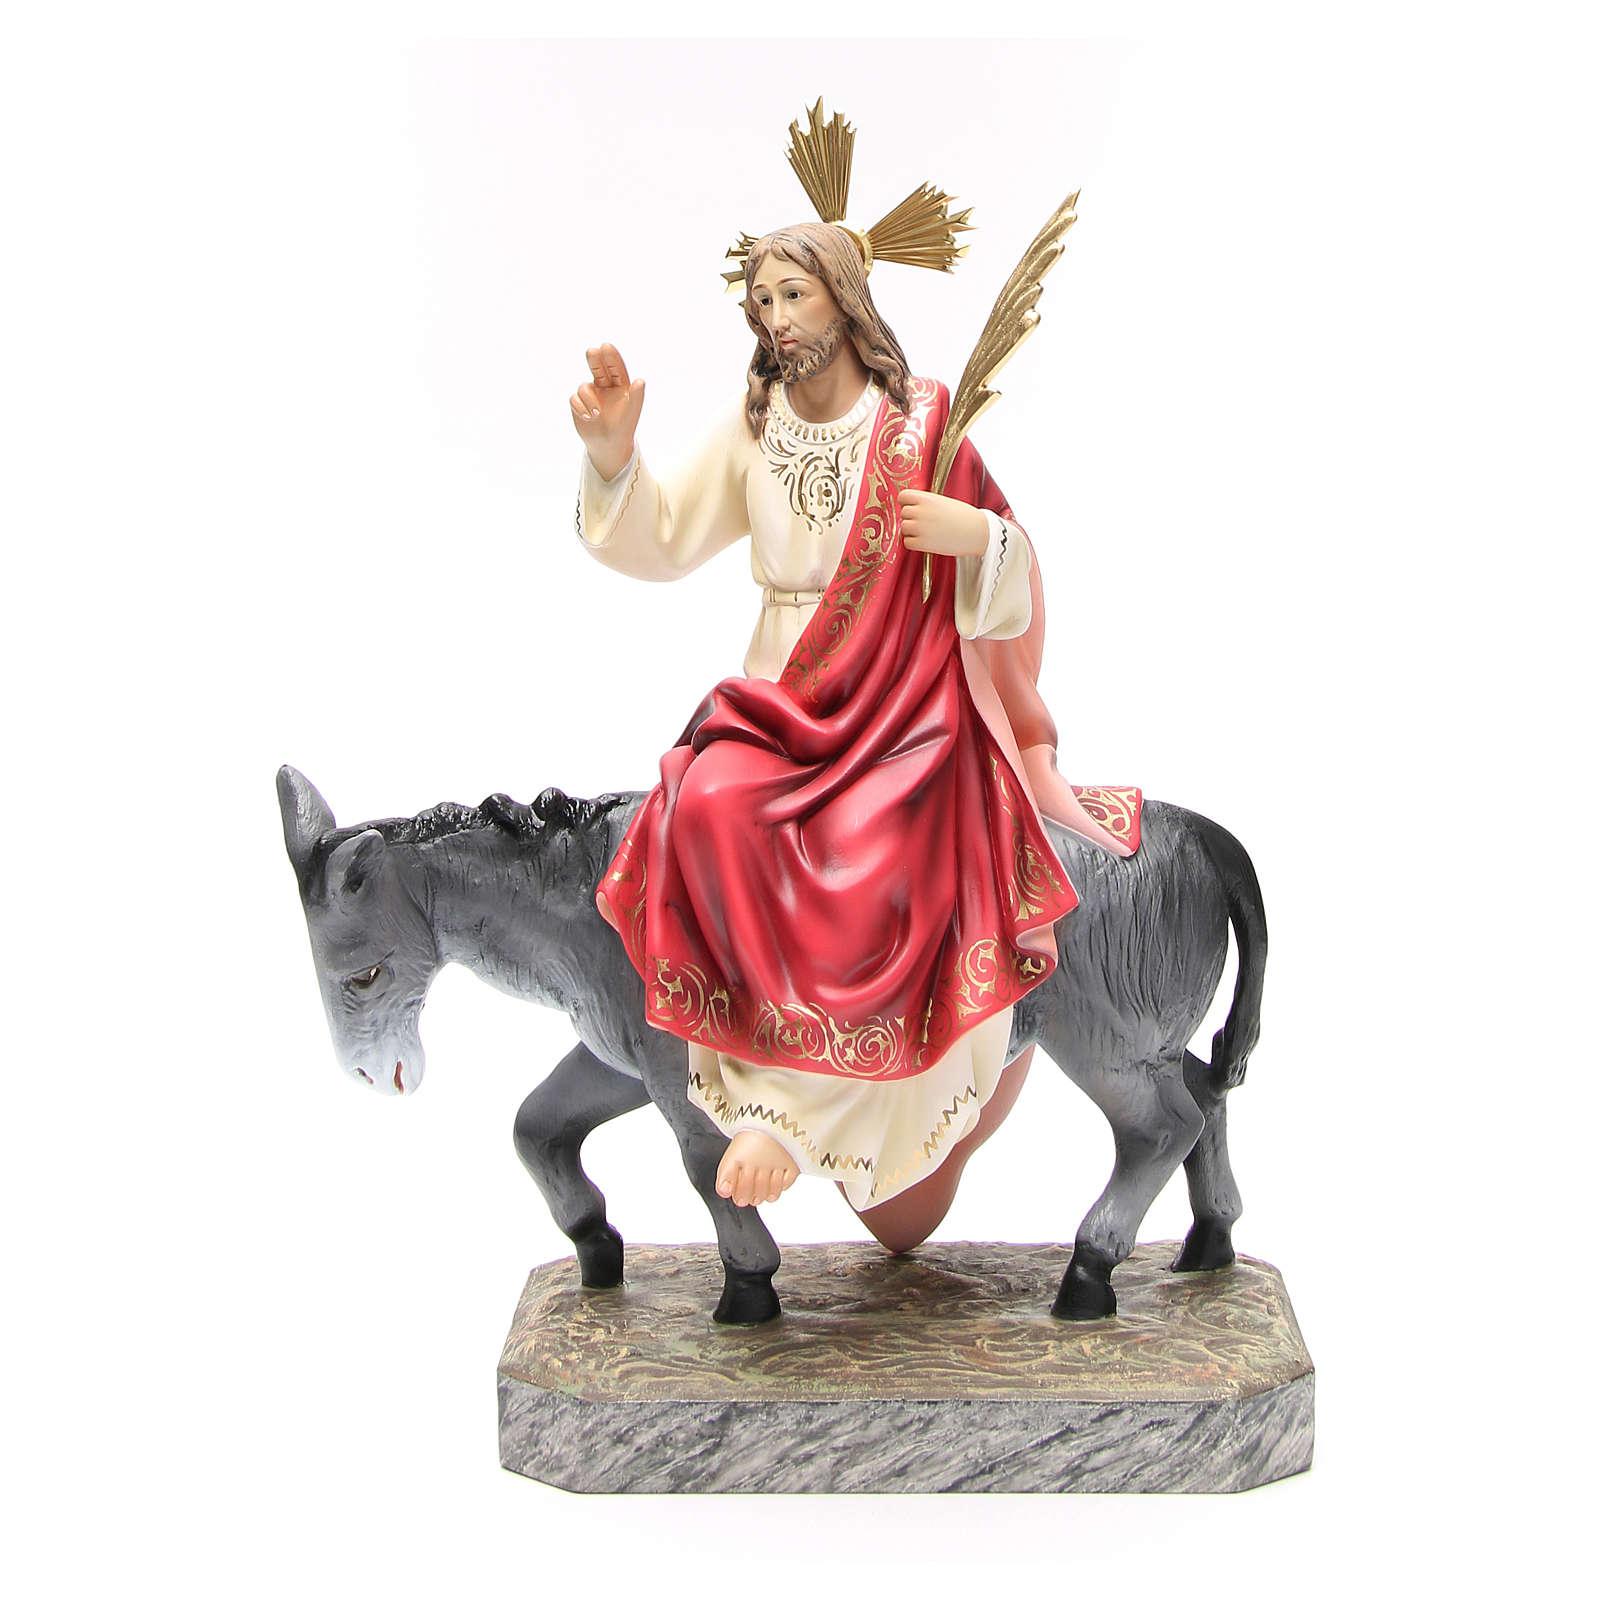 Entrata a Gerusalemme 40 cm pasta di legno dec. elegante 4